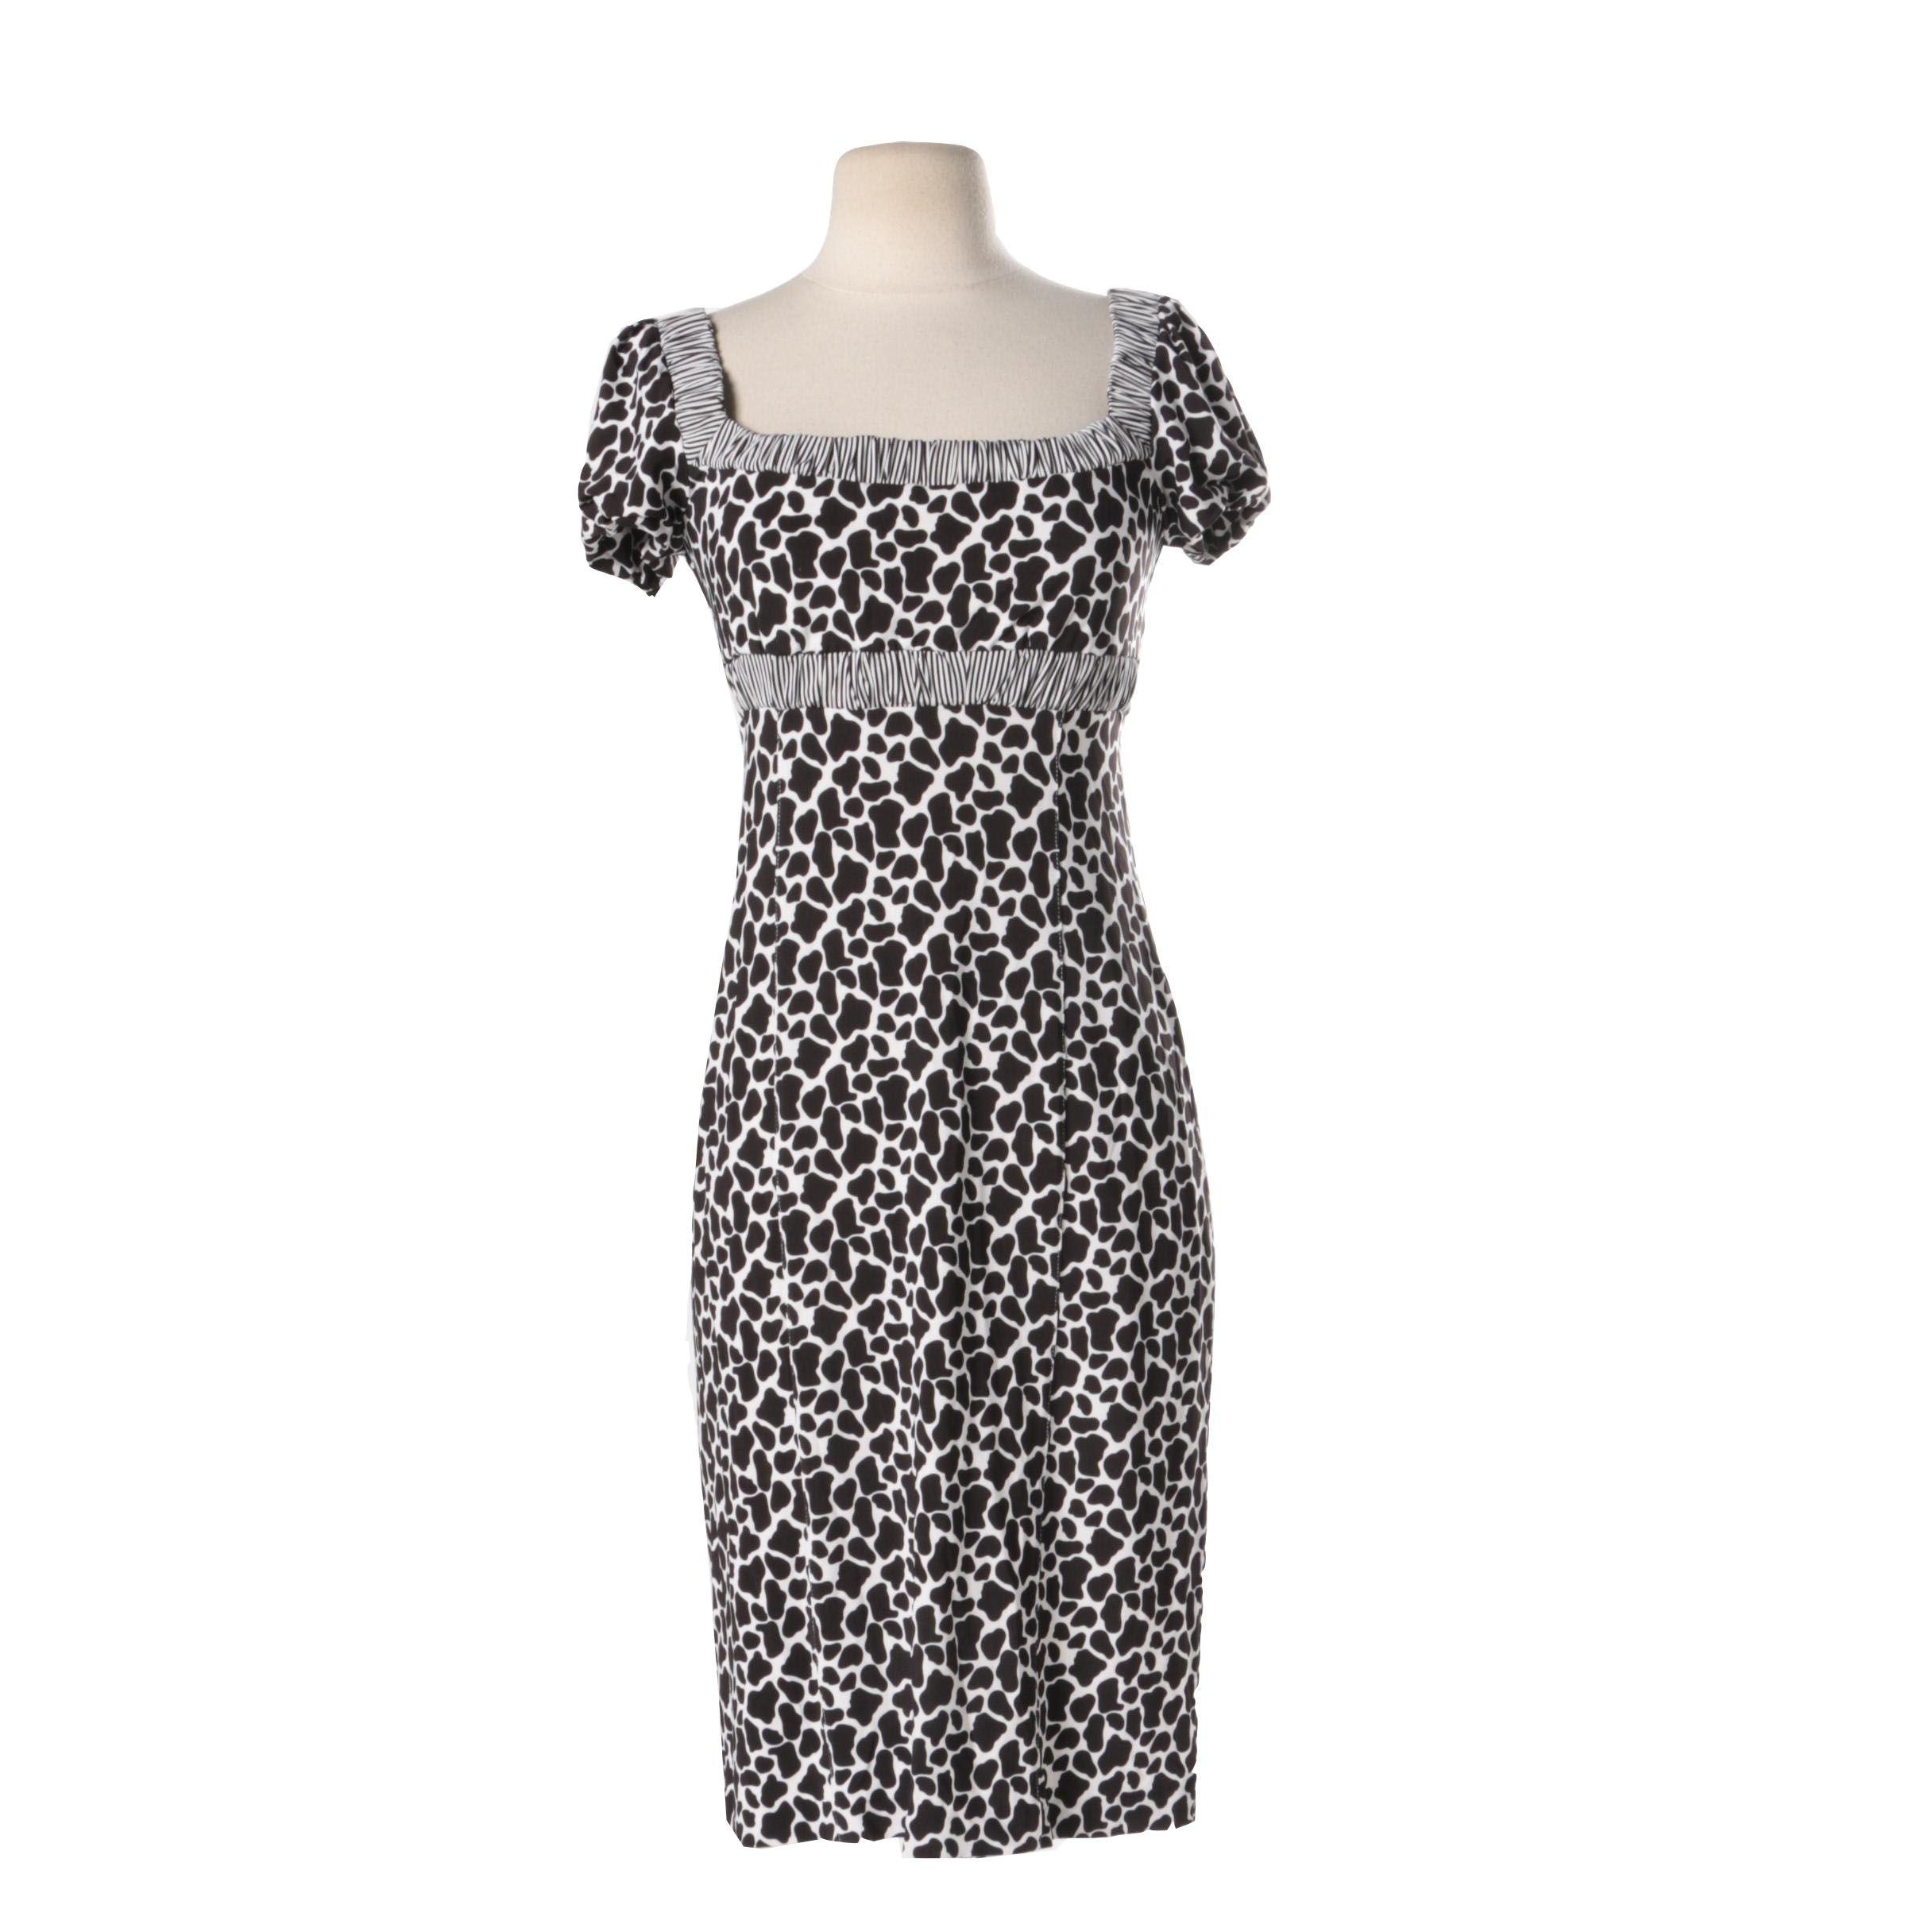 241 Animal Print Dress